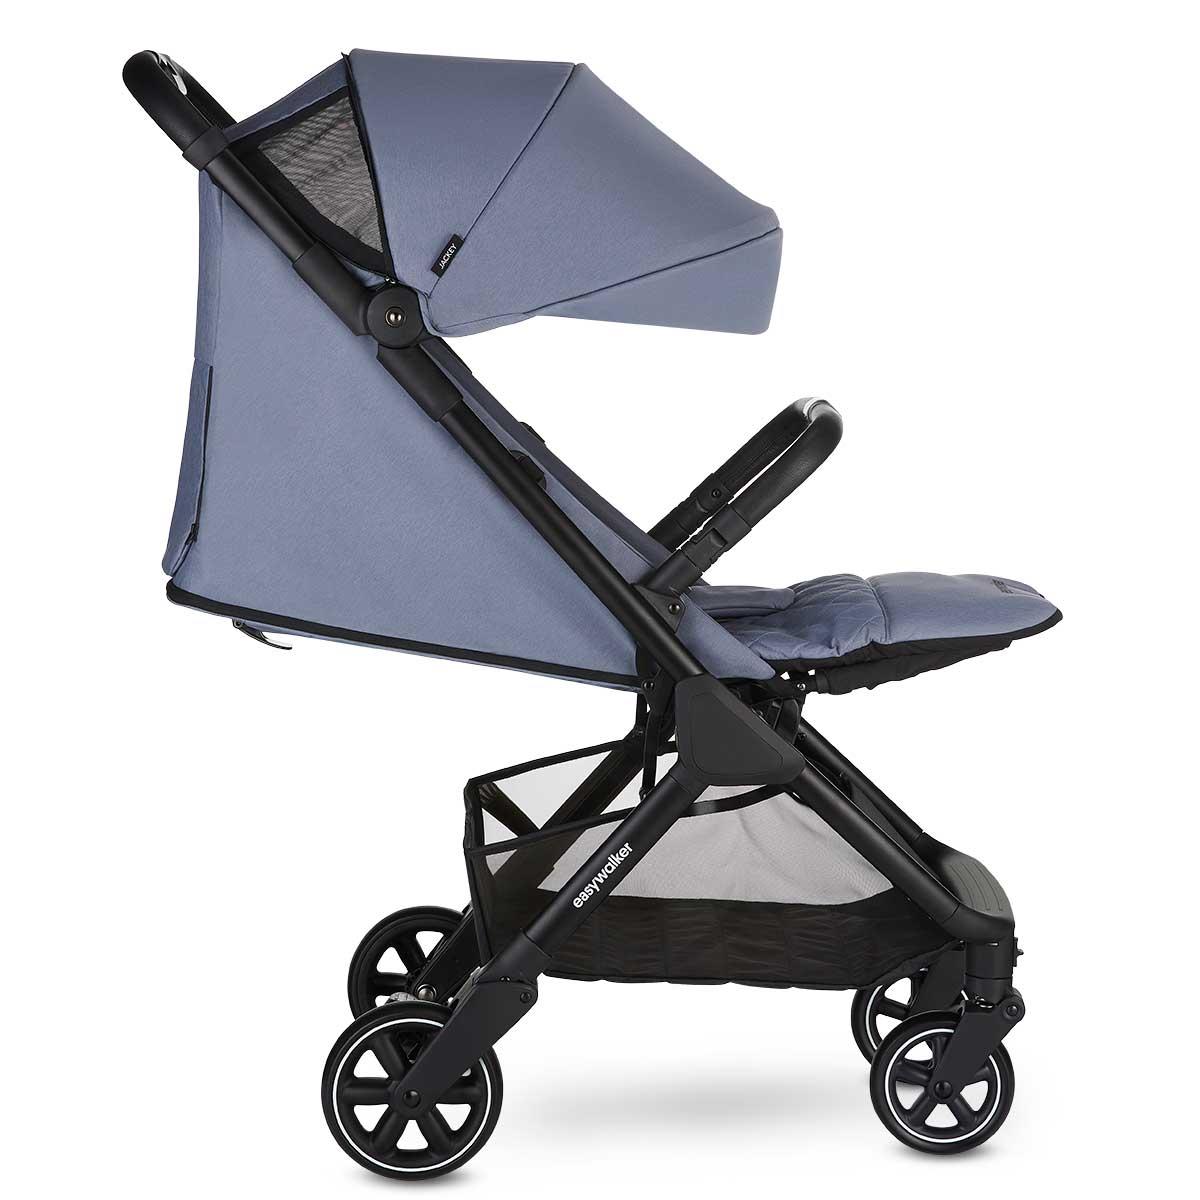 silla ligera easywalker mini buggy snap - Silla ligera EasyWalker Mini Buggy Snap